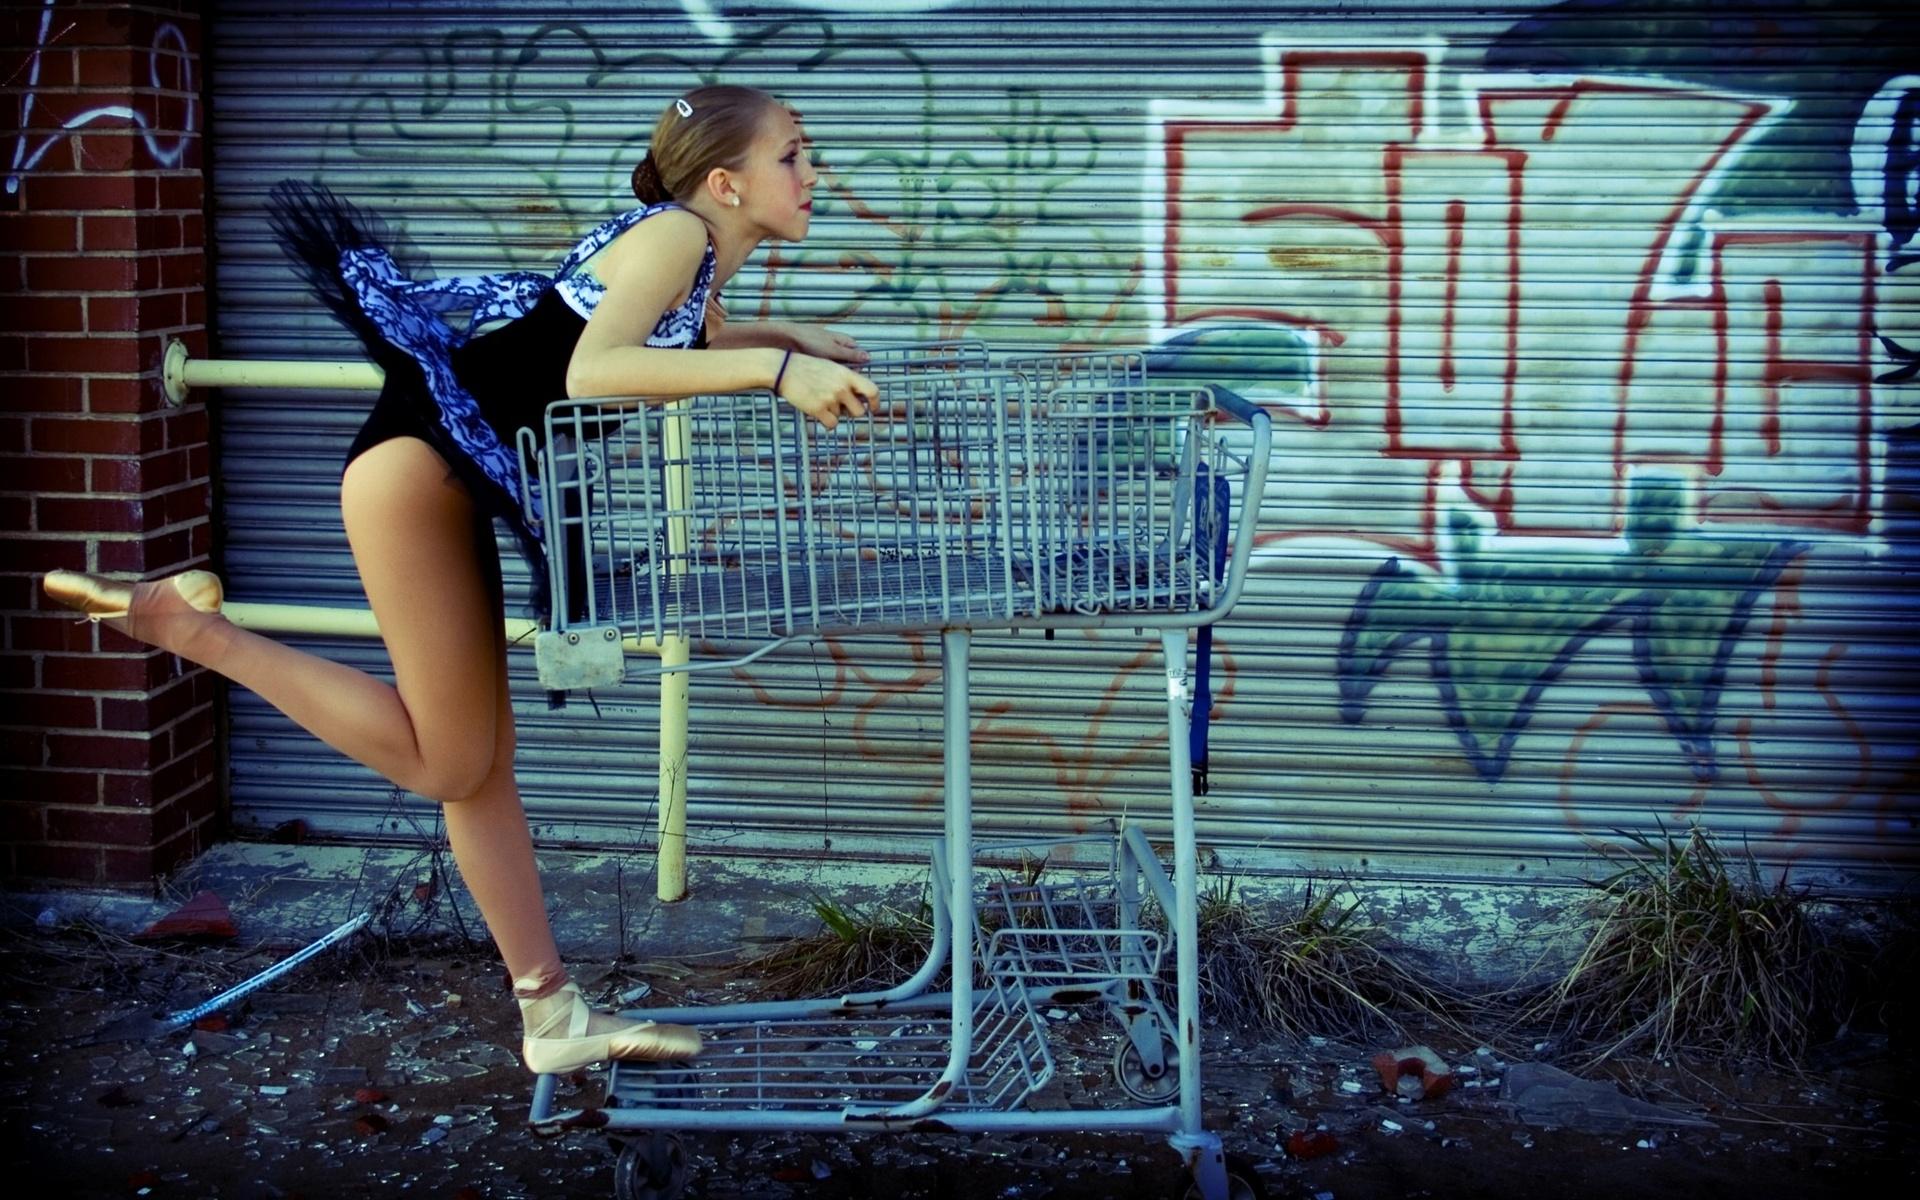 Ballet Dance Wallpapers Hd Dodskypict: Dance HD Wallpaper